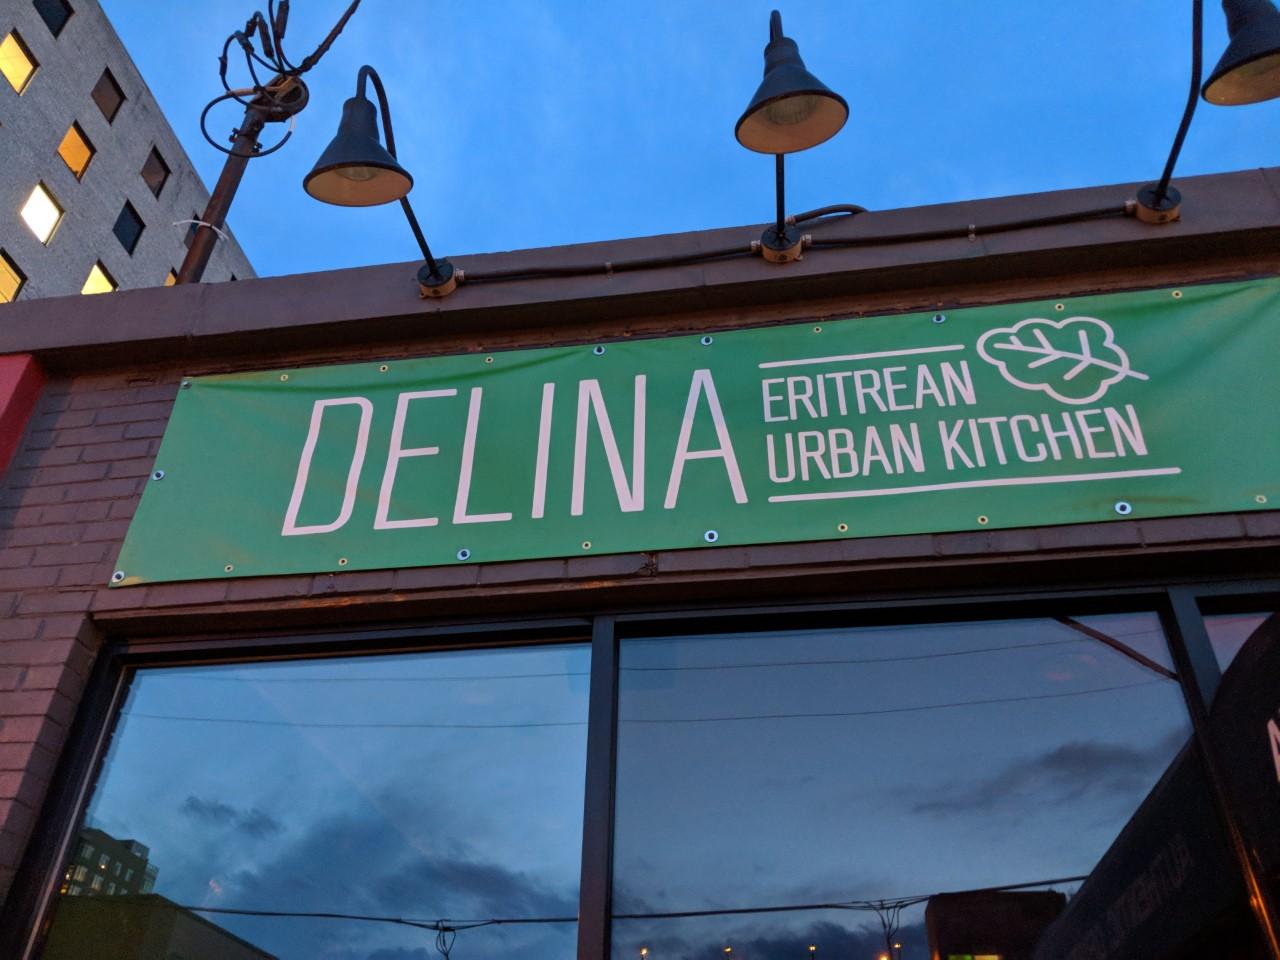 Robert Dyer @ Bethesda Row: Delina Eritrean Urban Kitchen misses ...